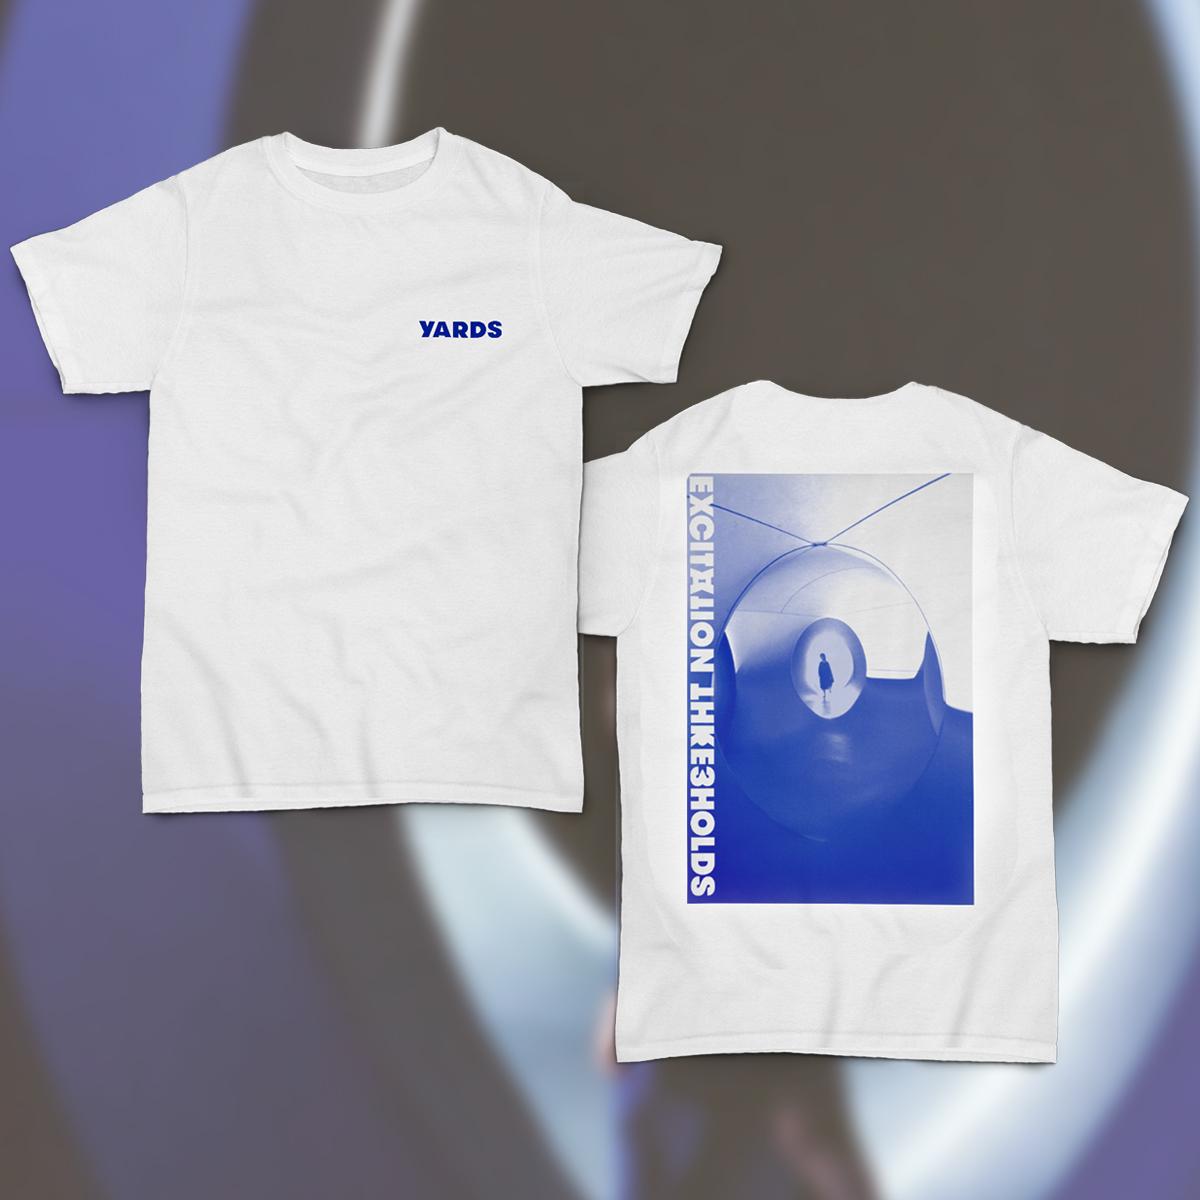 YARDS - Excitation Thresholds Shirt